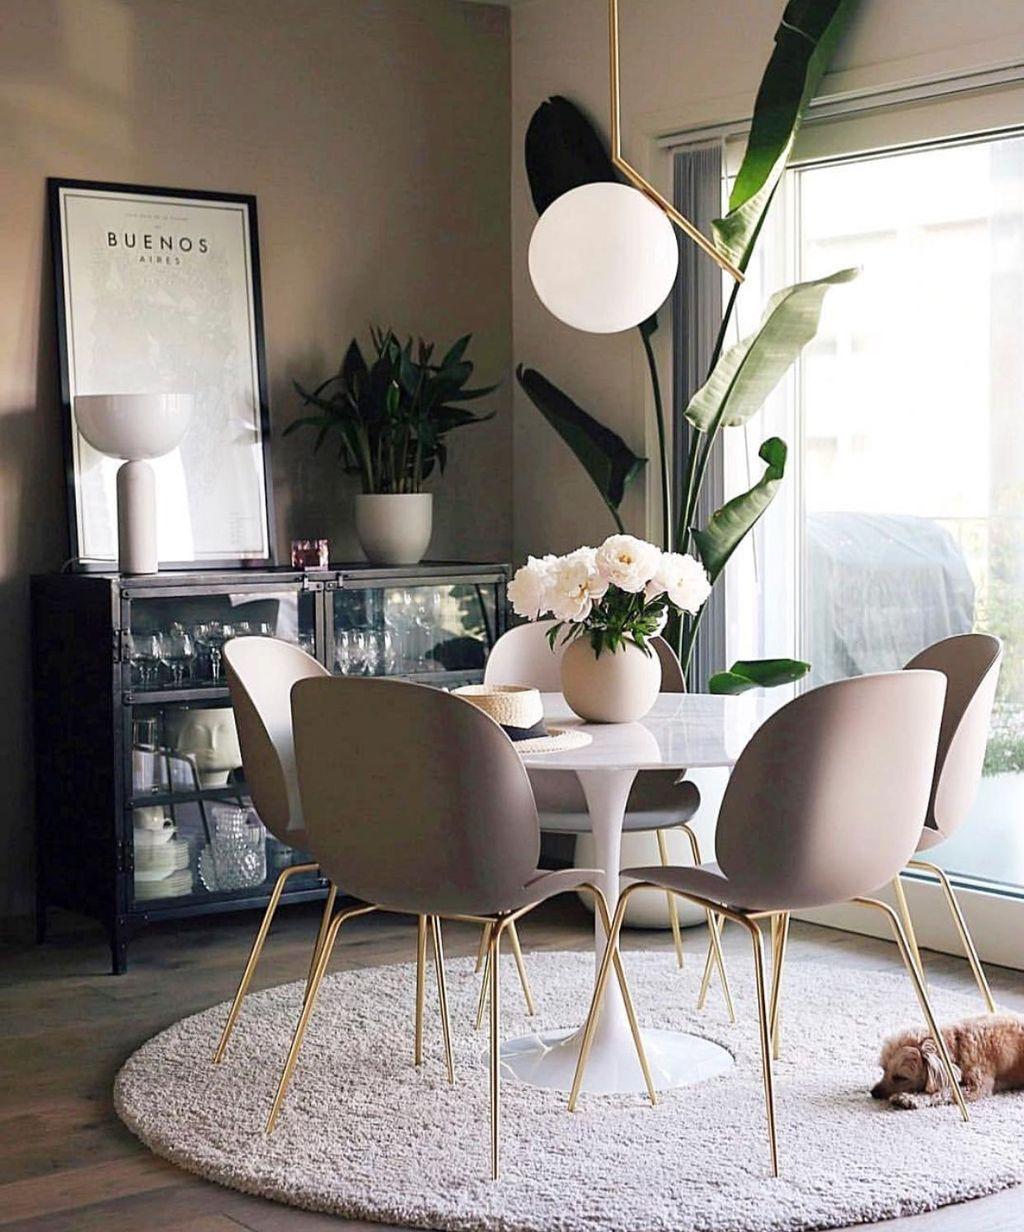 39 Elegant Small Dining Room Decorating Ideas Dining Room Small Minimalist Dining Room Rustic Dining Room